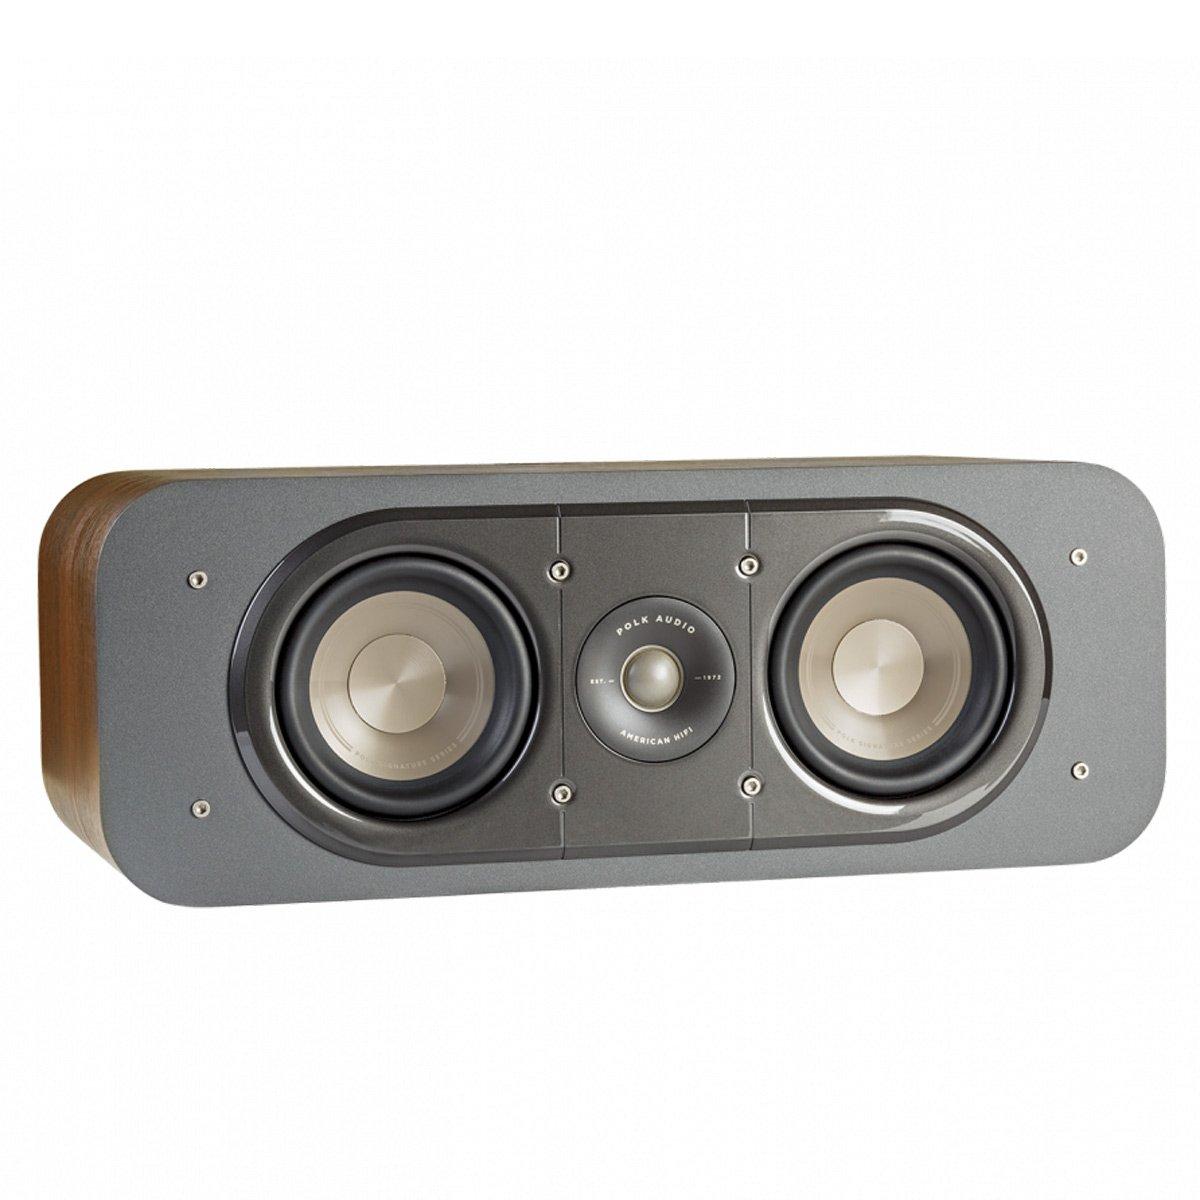 Polk Audio Signature Series S30 American Hi-Fi Home Theater Center Speaker (Classic Brown Walnut) by Polk Audio